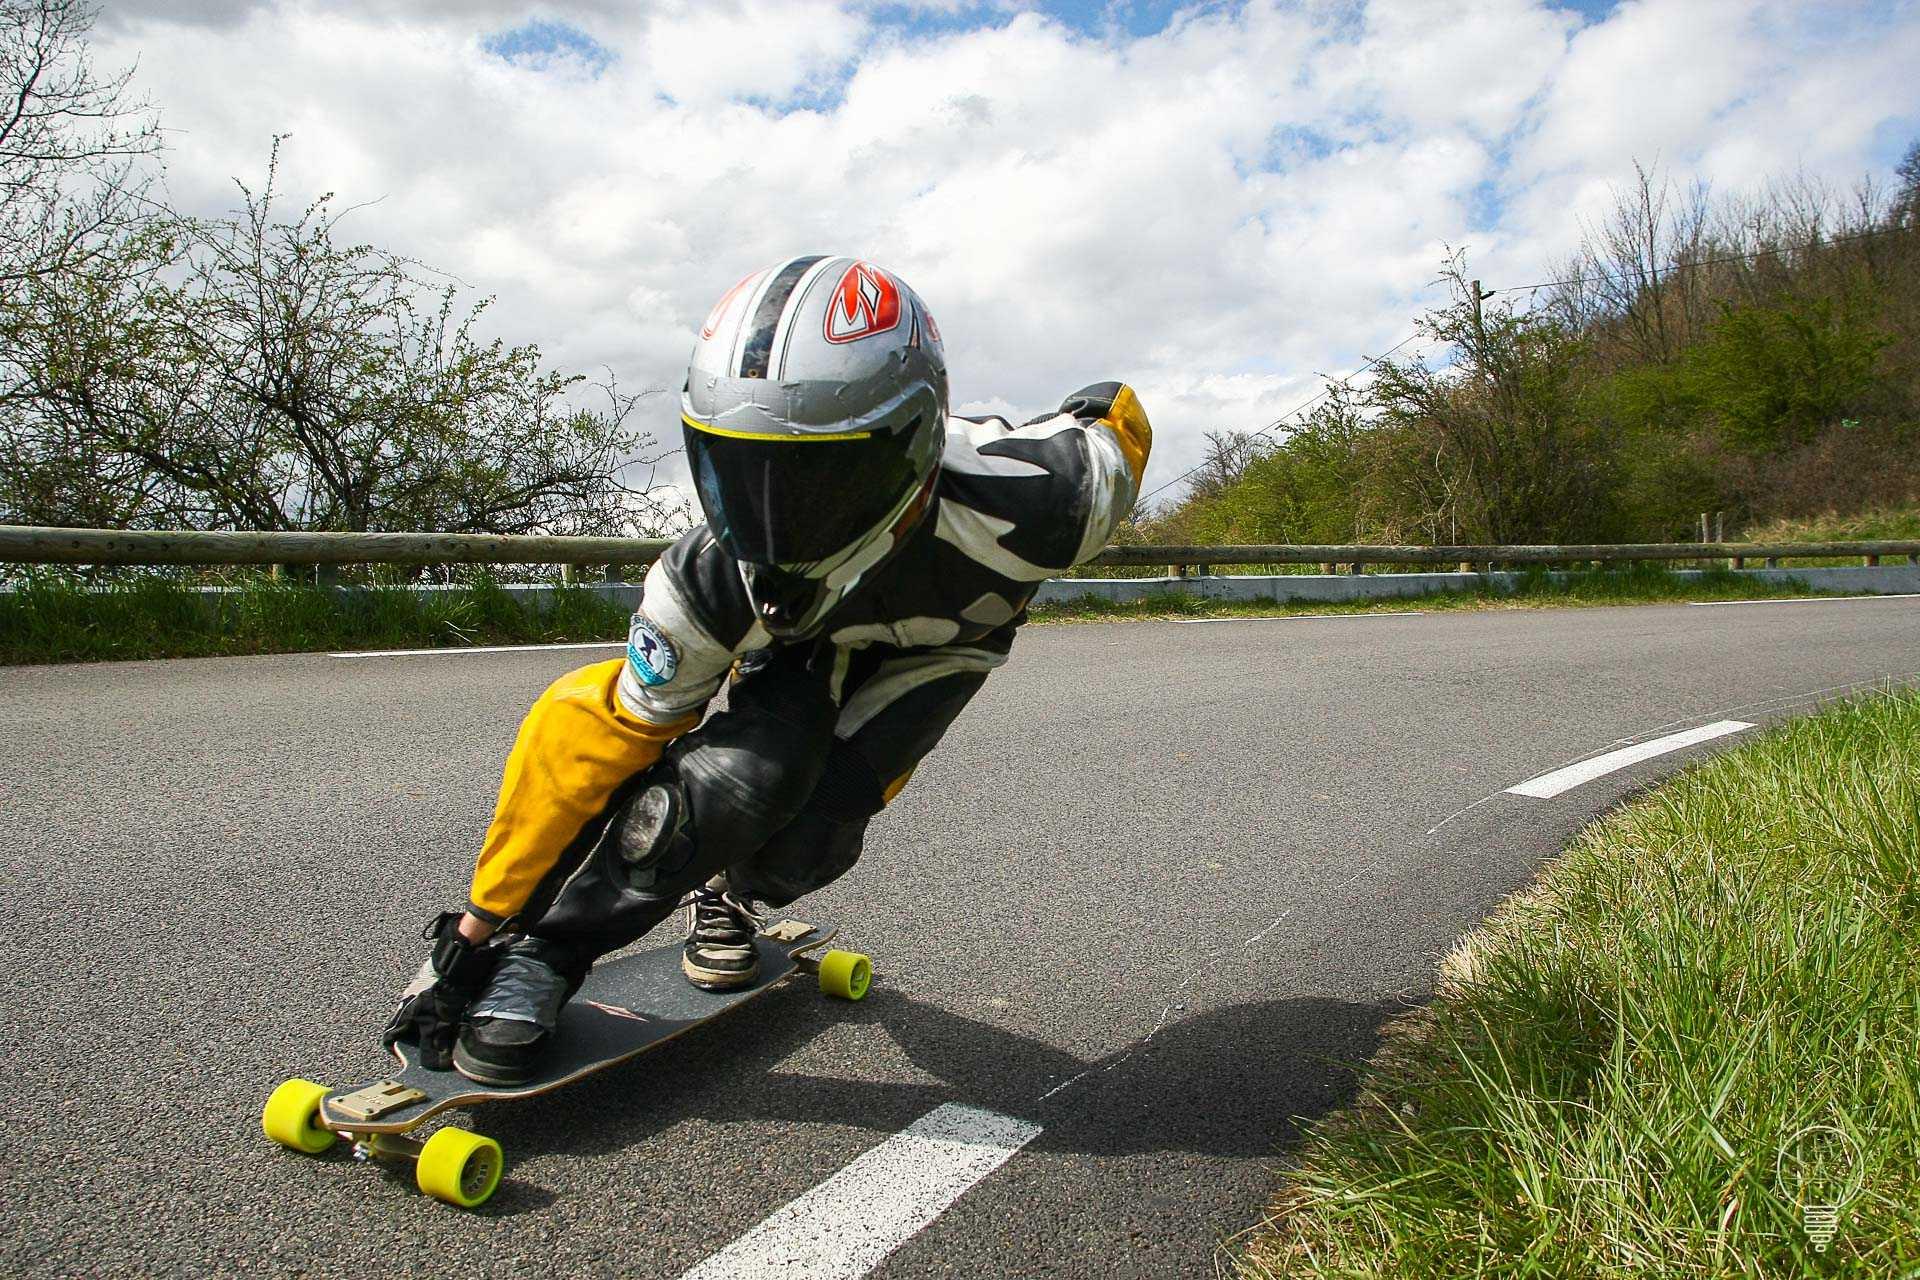 Longboard - Skate de descente - Lyon 69